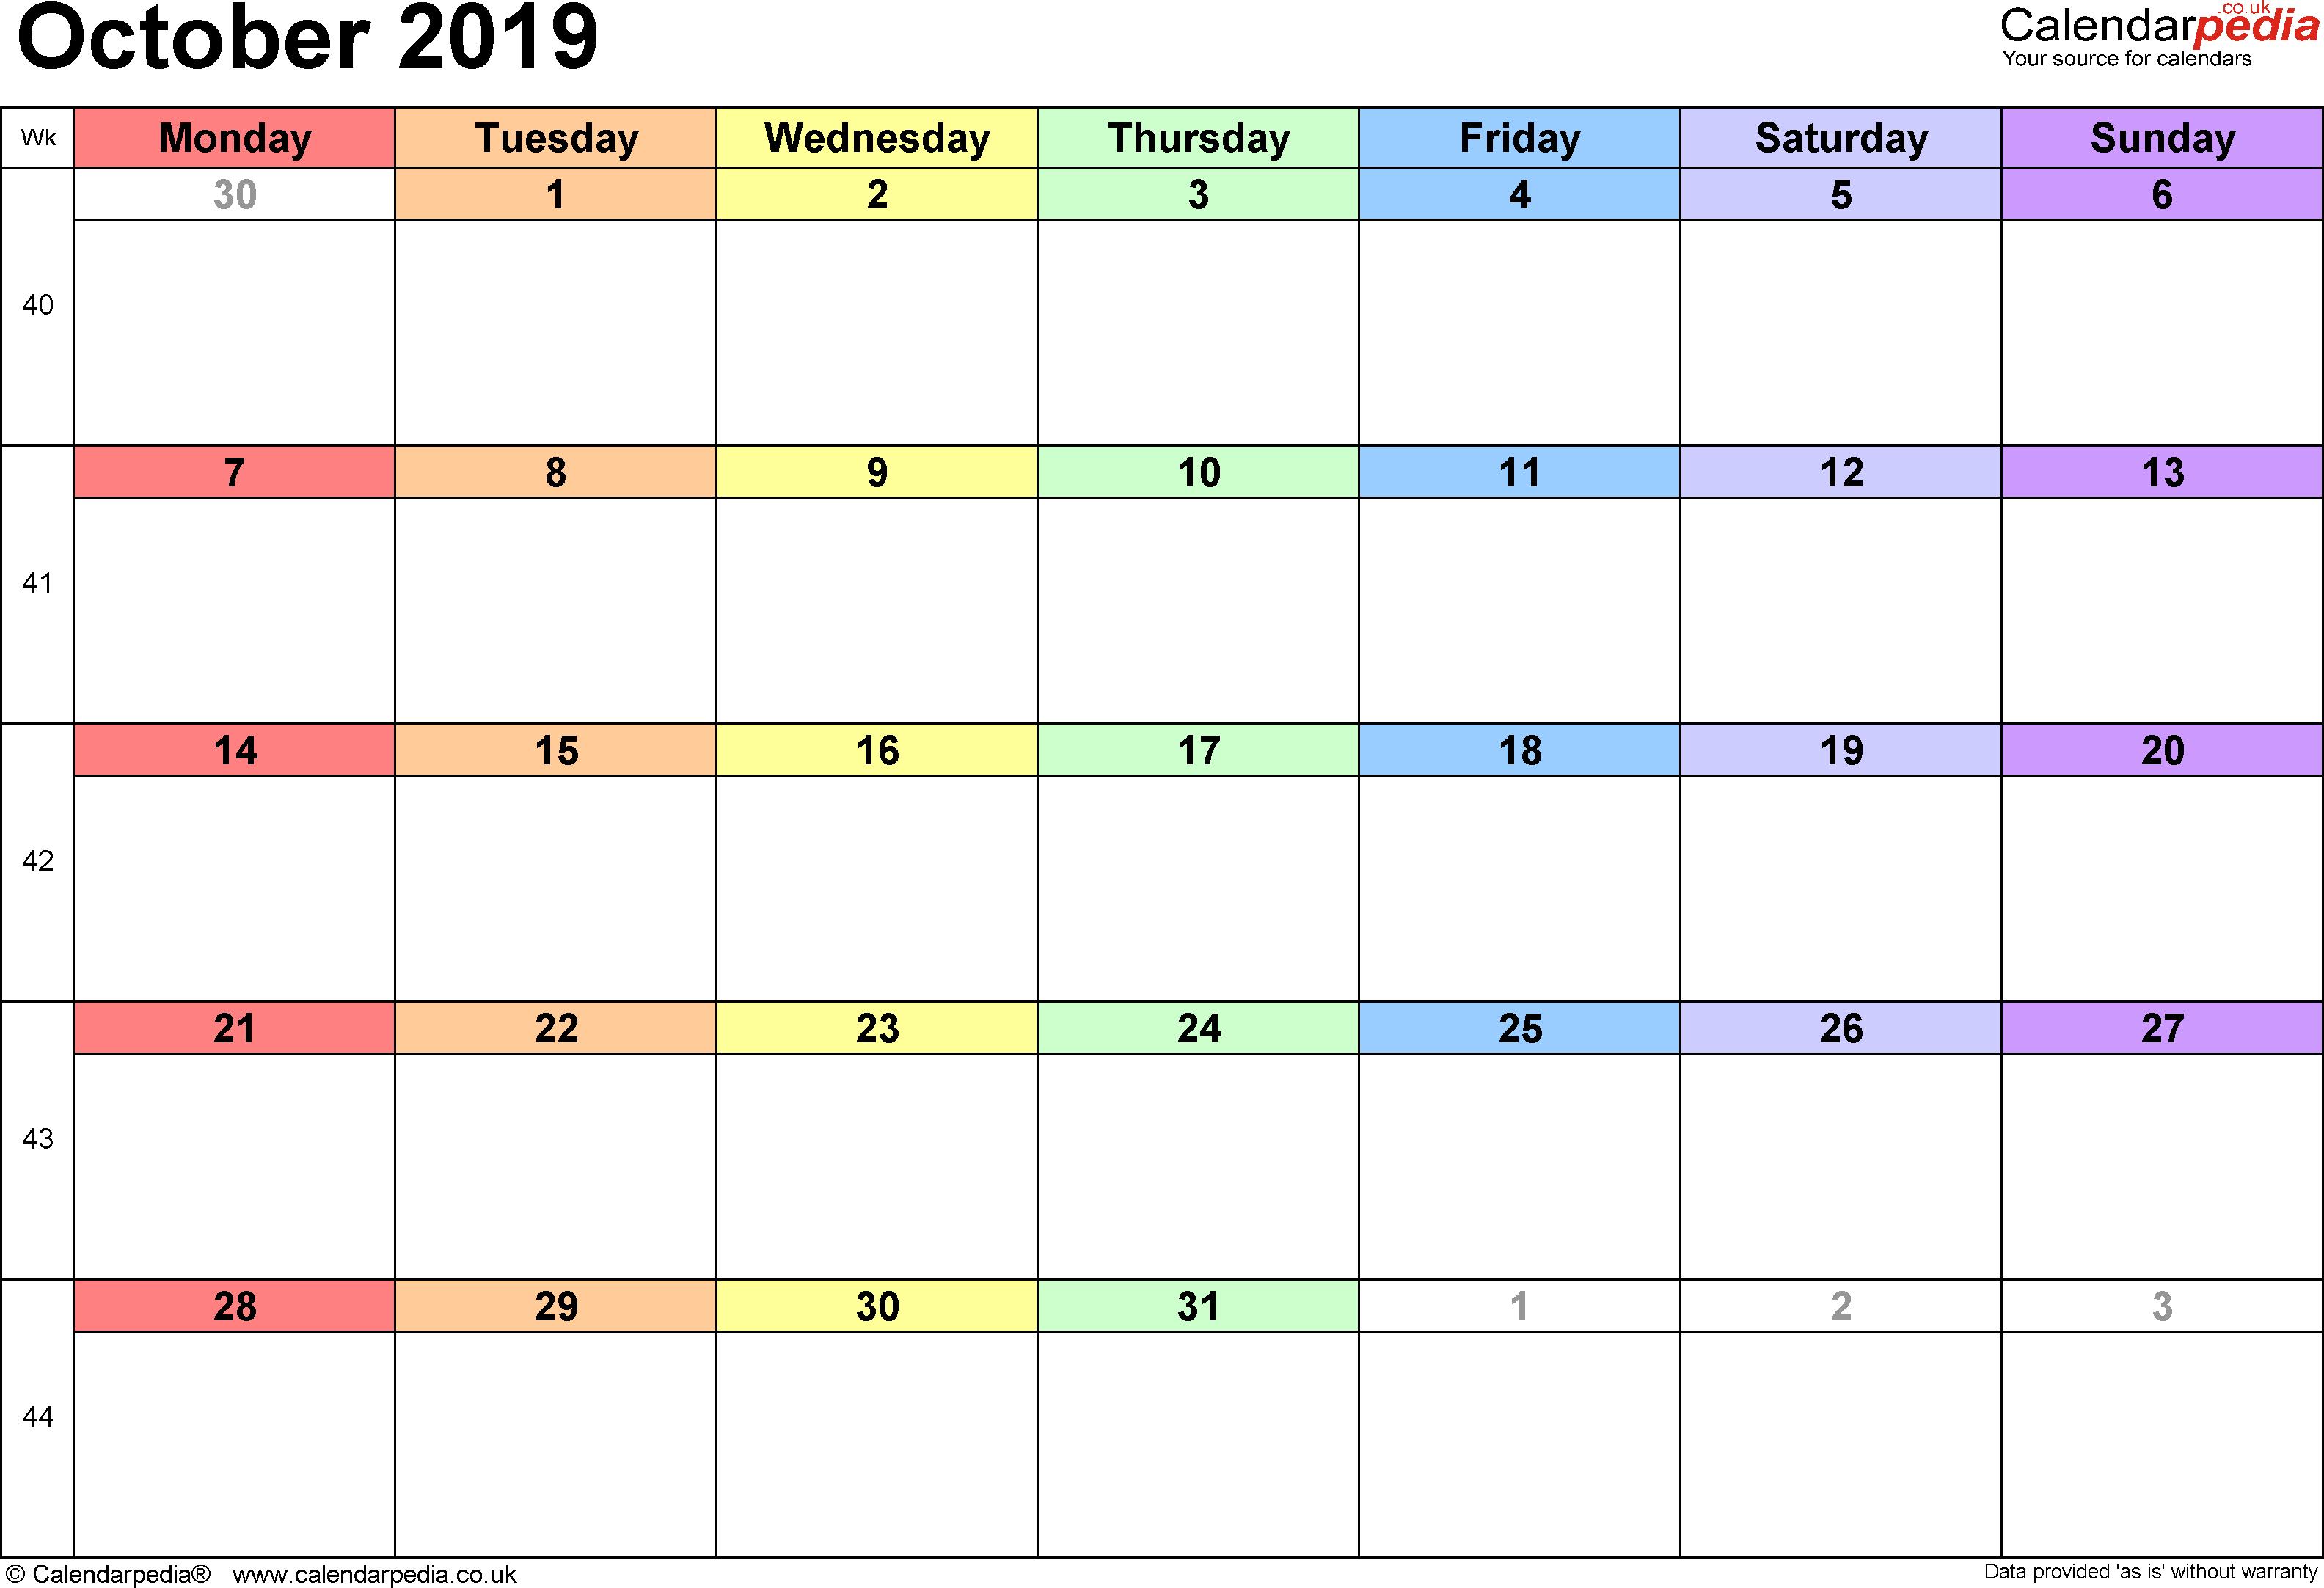 Calendar October 2019 Uk, Bank Holidays, Excel/pdf/word Templates within Calendar October 2019 Pocket Calendar